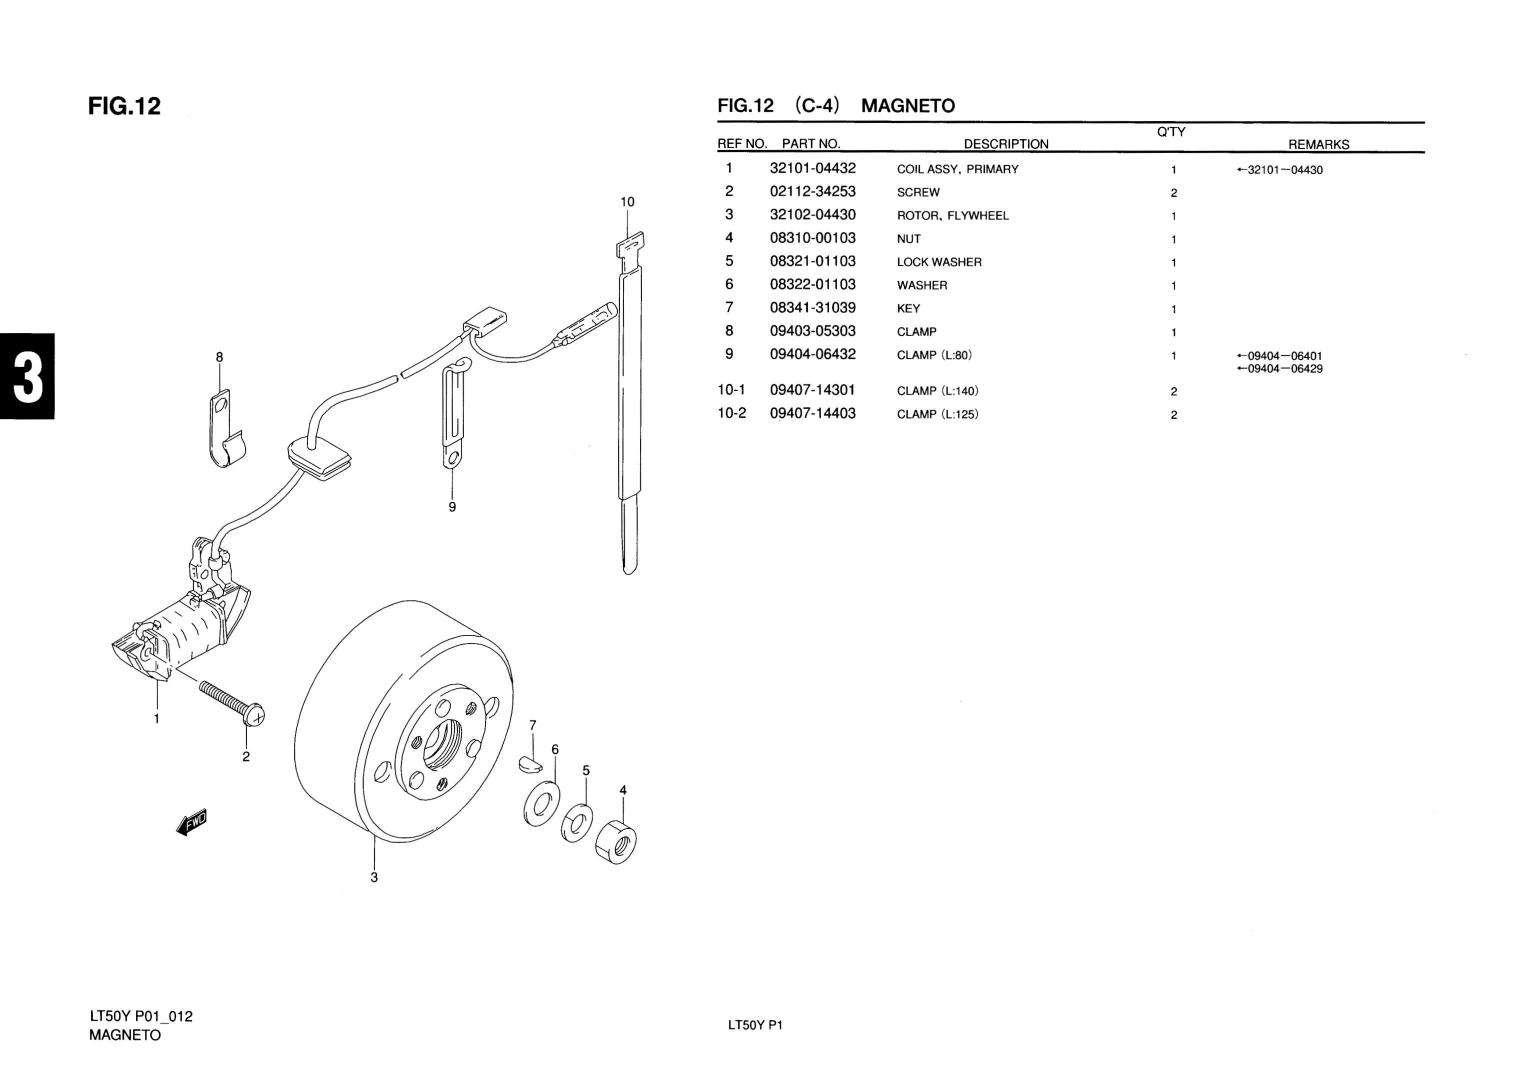 1997 suzuki lt50 parts diagram how to use data flow genuine mini atv quad magneto flywheel rotor